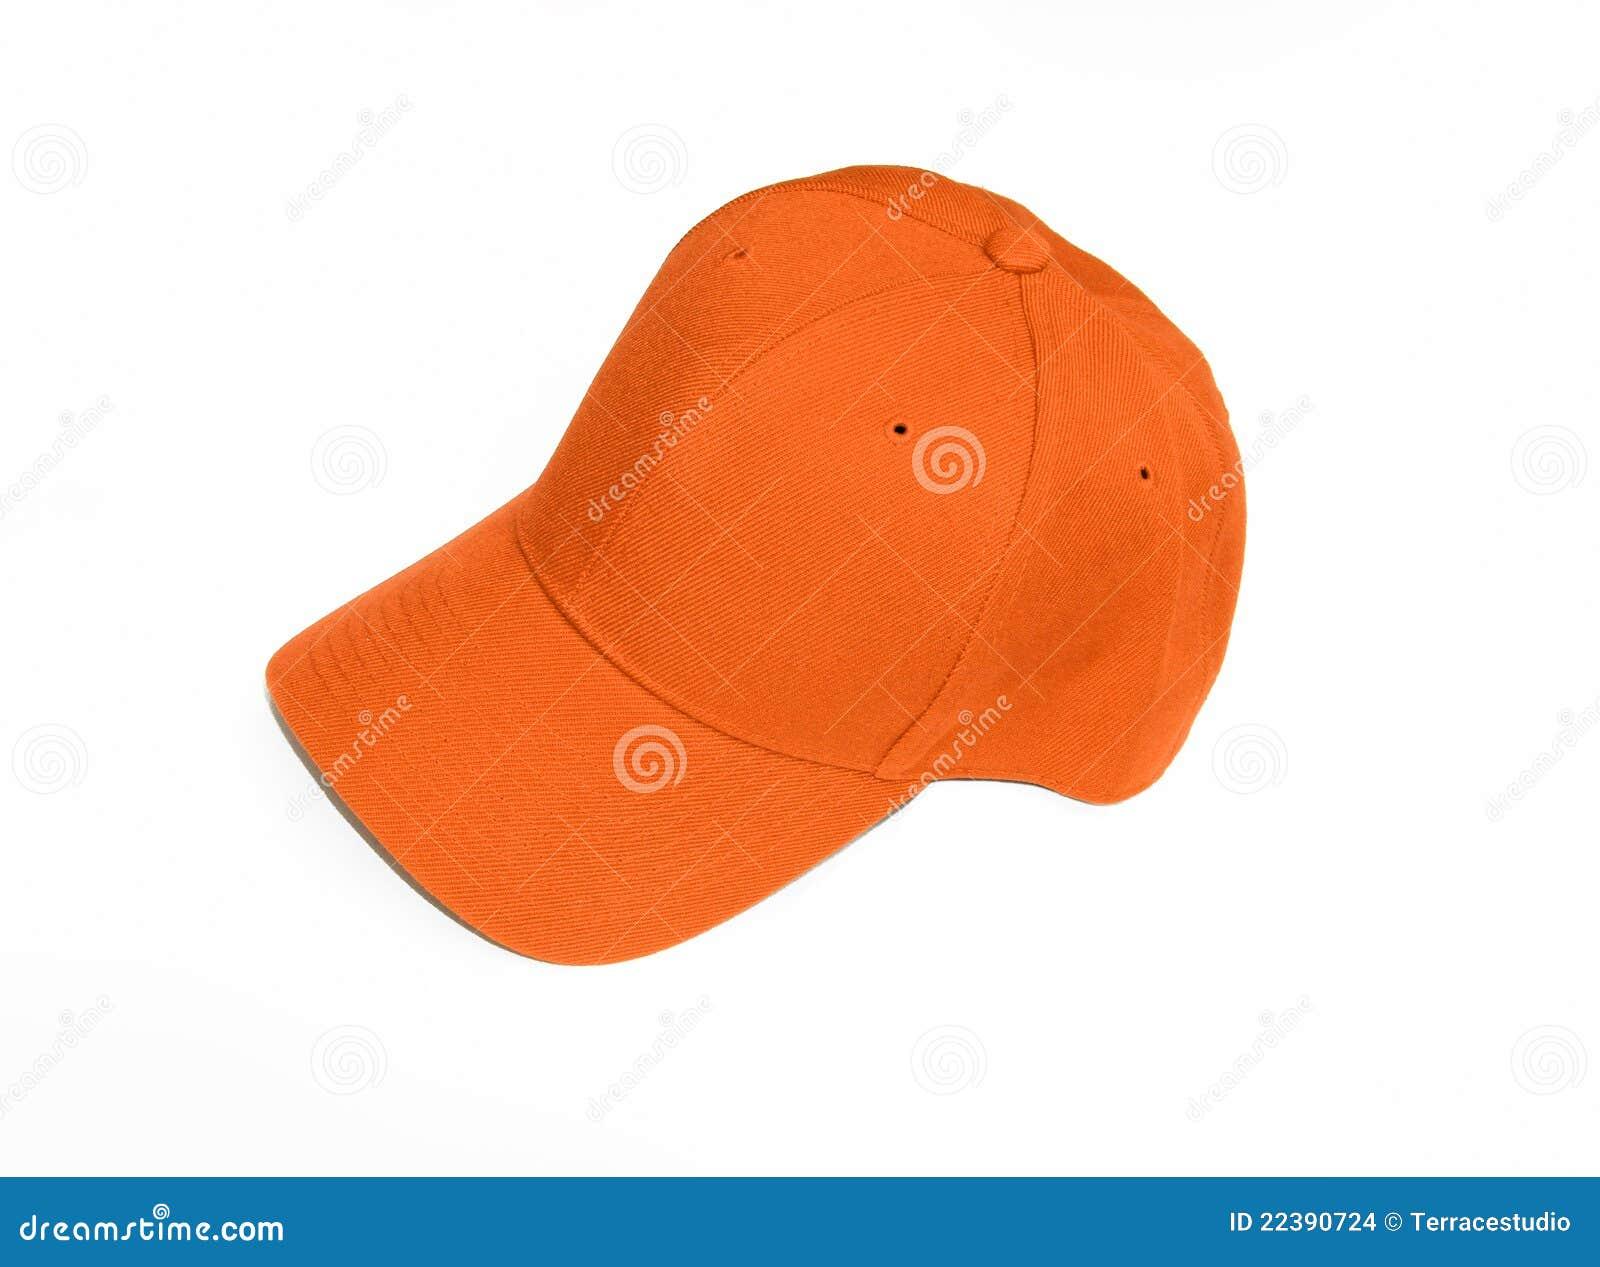 New Orange Baseball Cap Hat